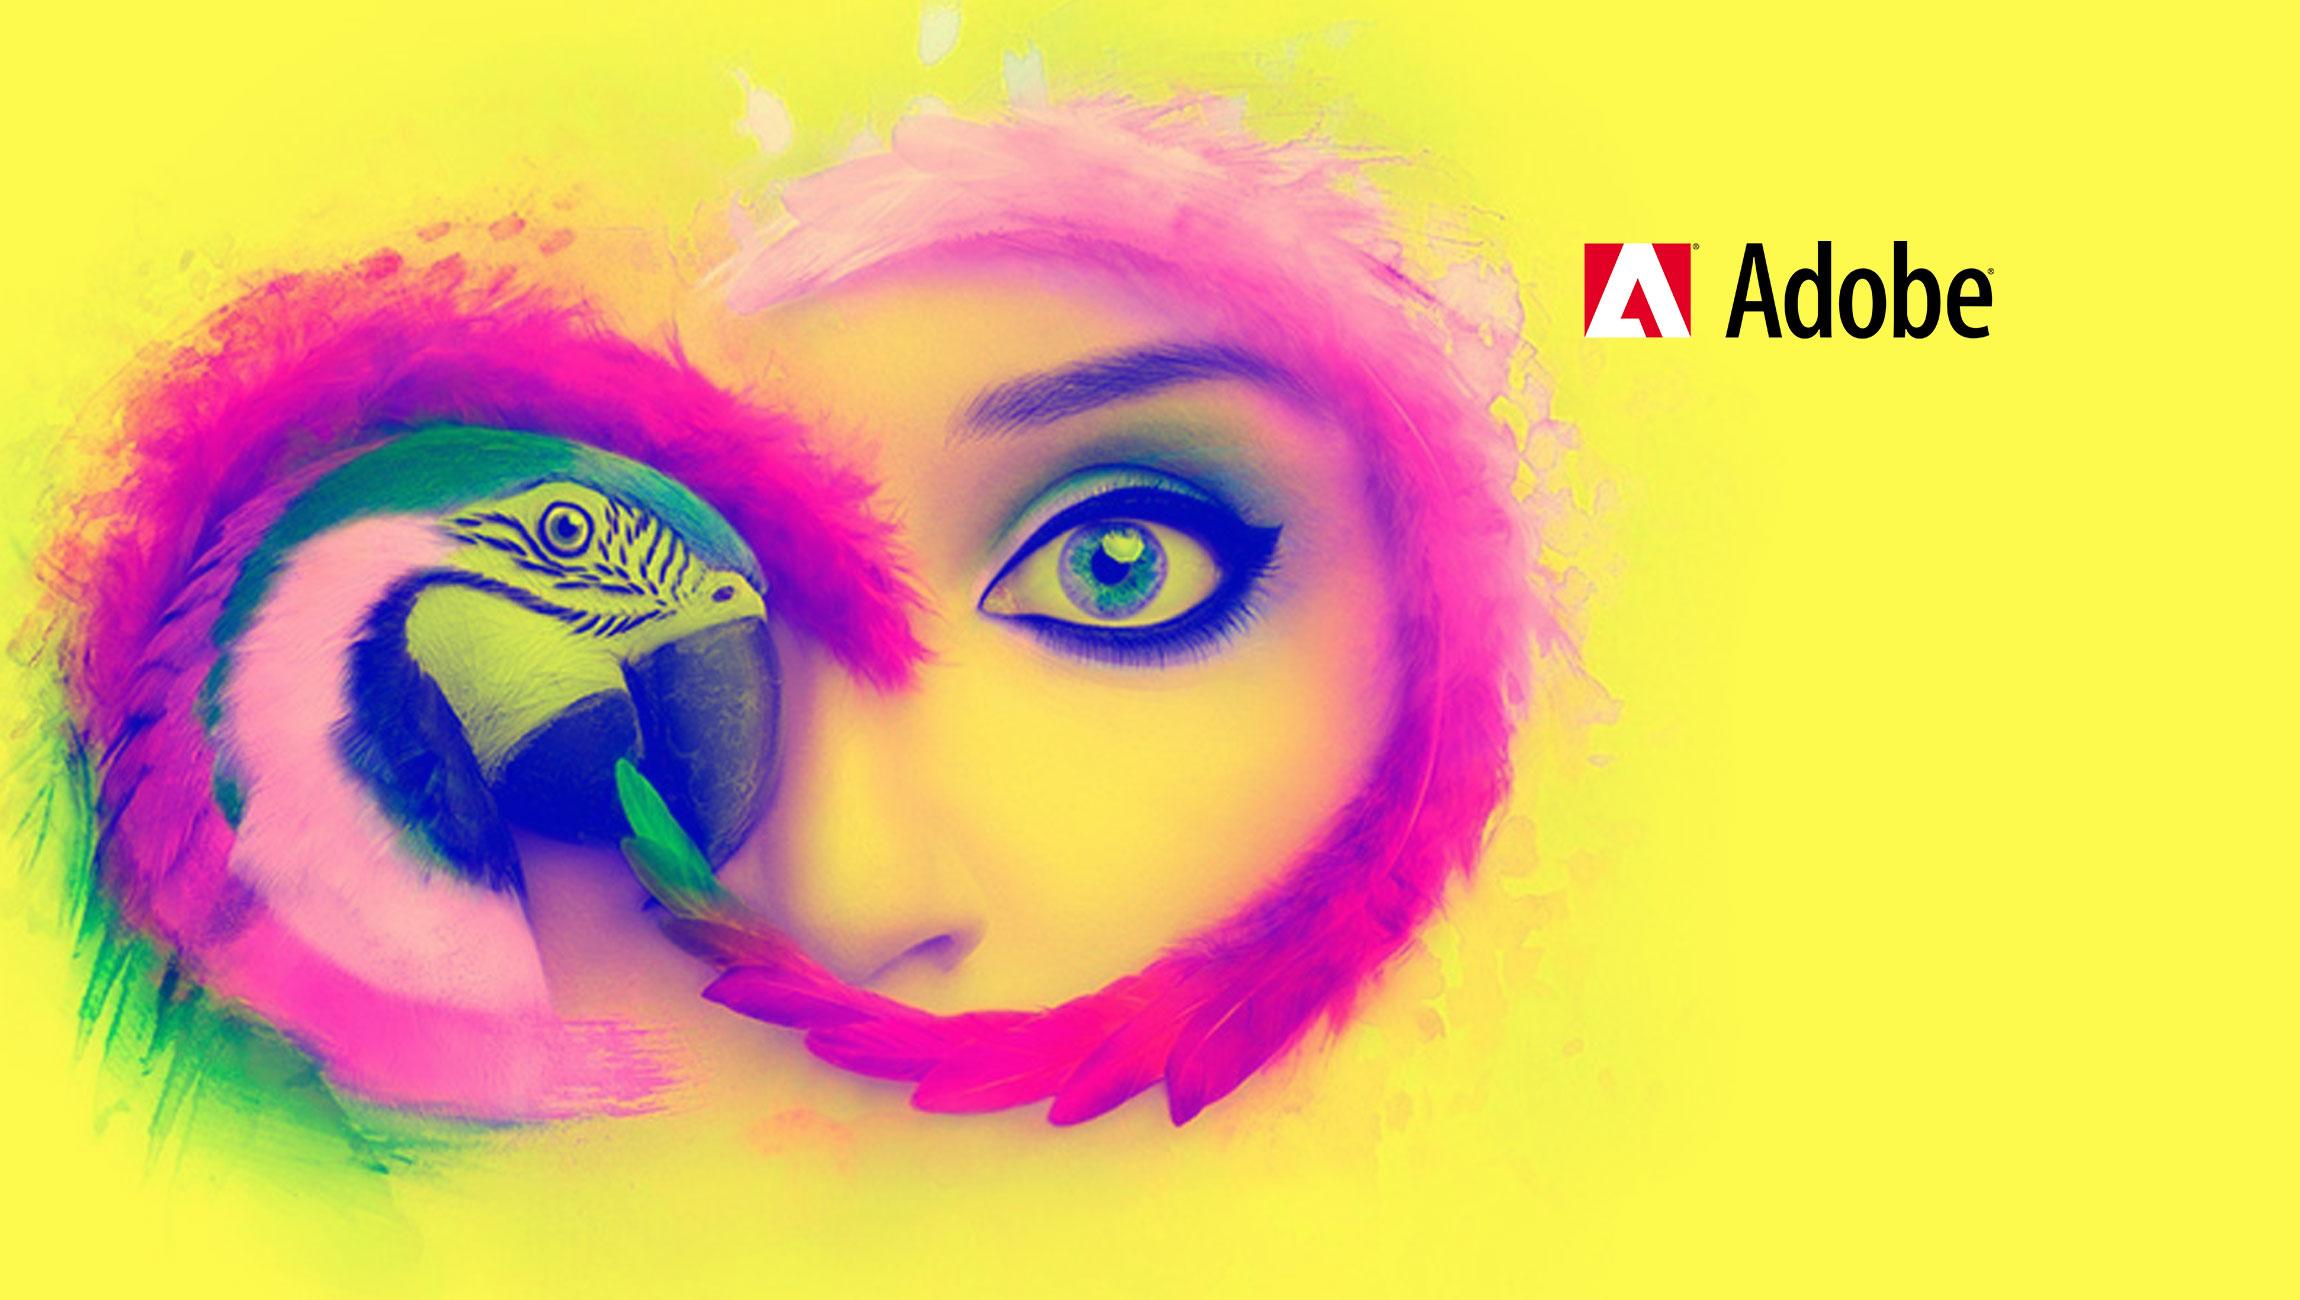 Adobe Named a Leader in 2019 Gartner Magic Quadrant for Personalization Engines & Magic Quadrant for Web Content Management